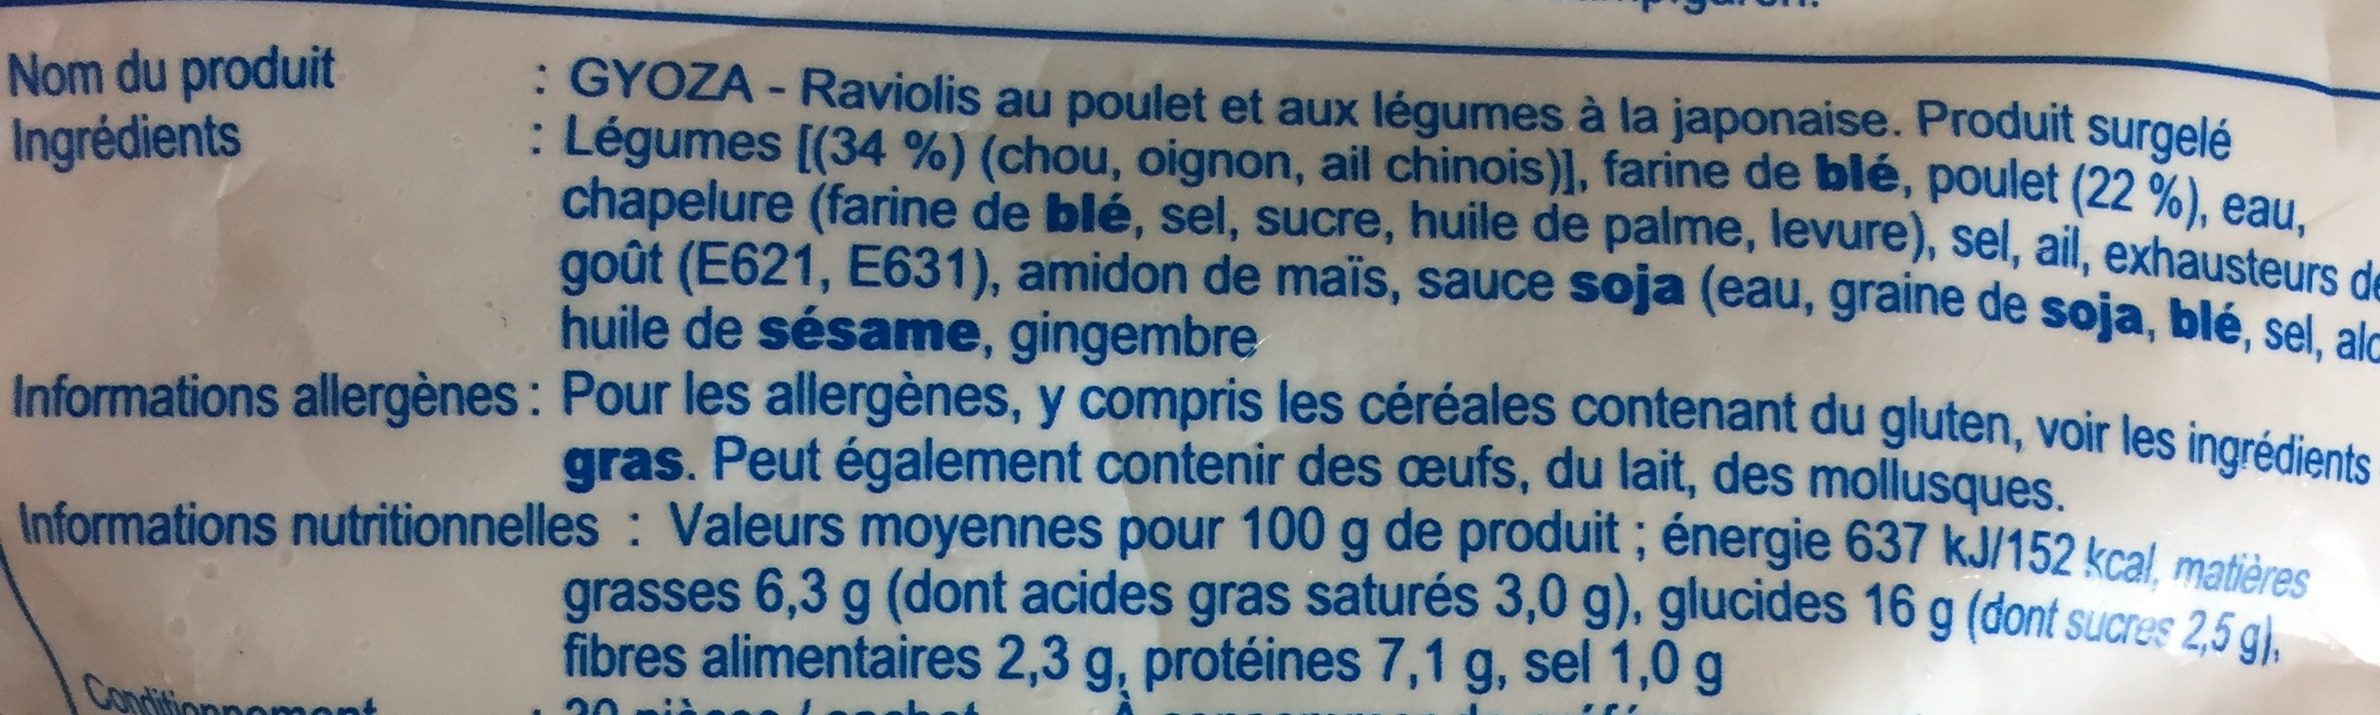 30 Gyozas Poulet Et Legumes - Ingredienti - fr